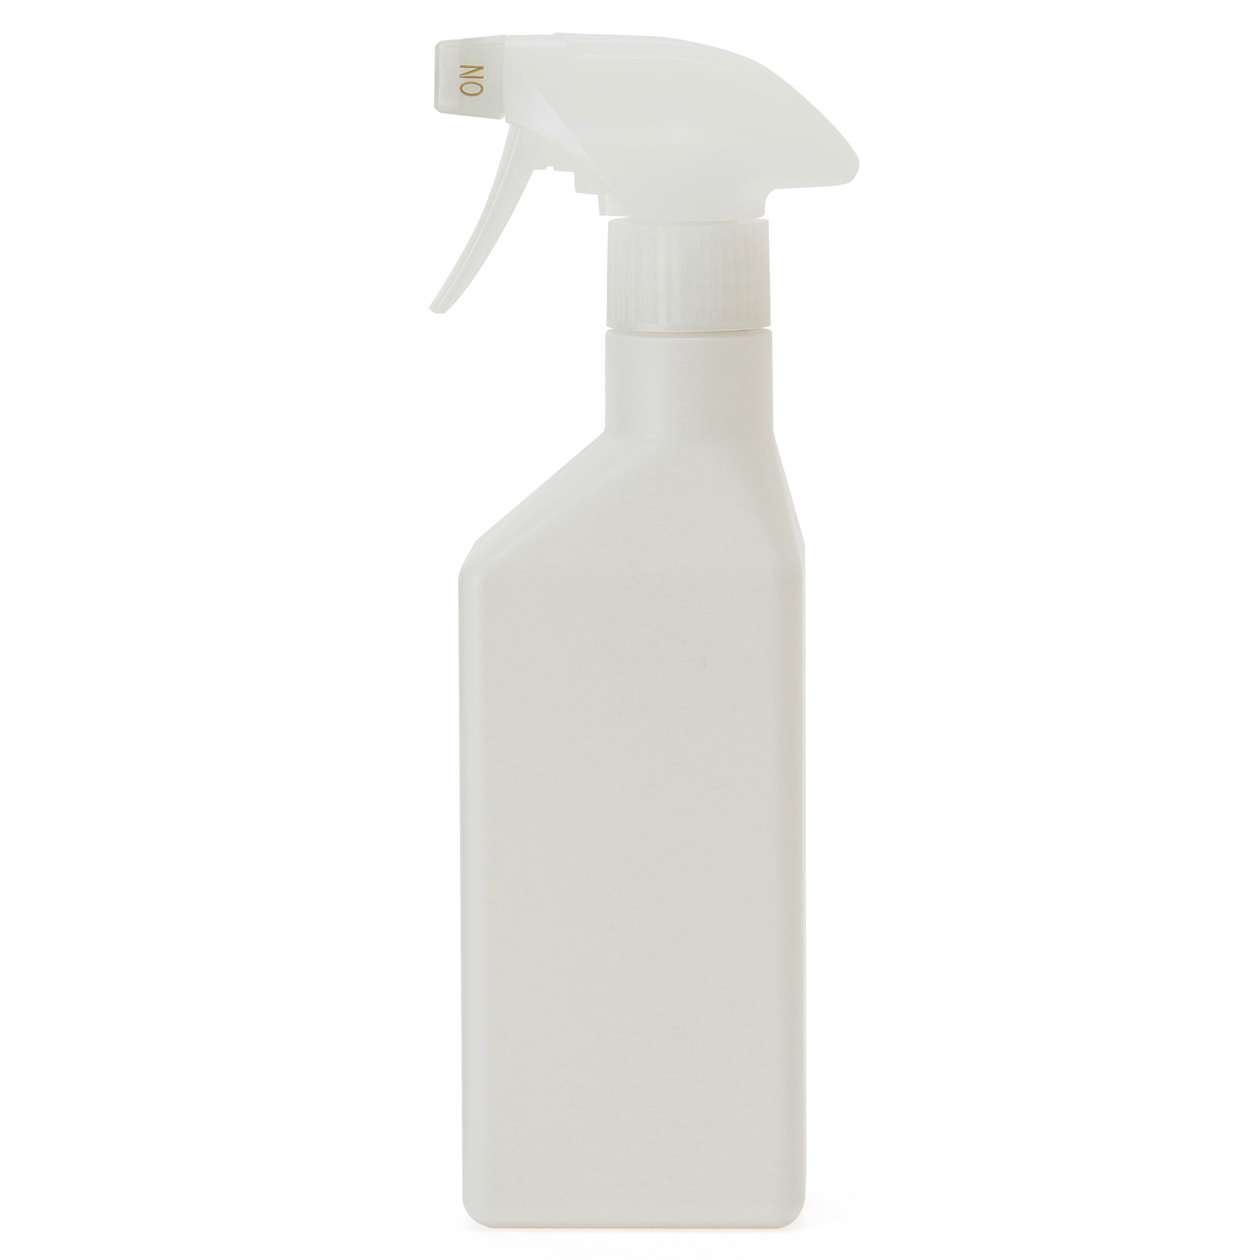 RoomClip商品情報 - ポリプロピレンスプレーボトル・アルカリ電解水クリーナー専用